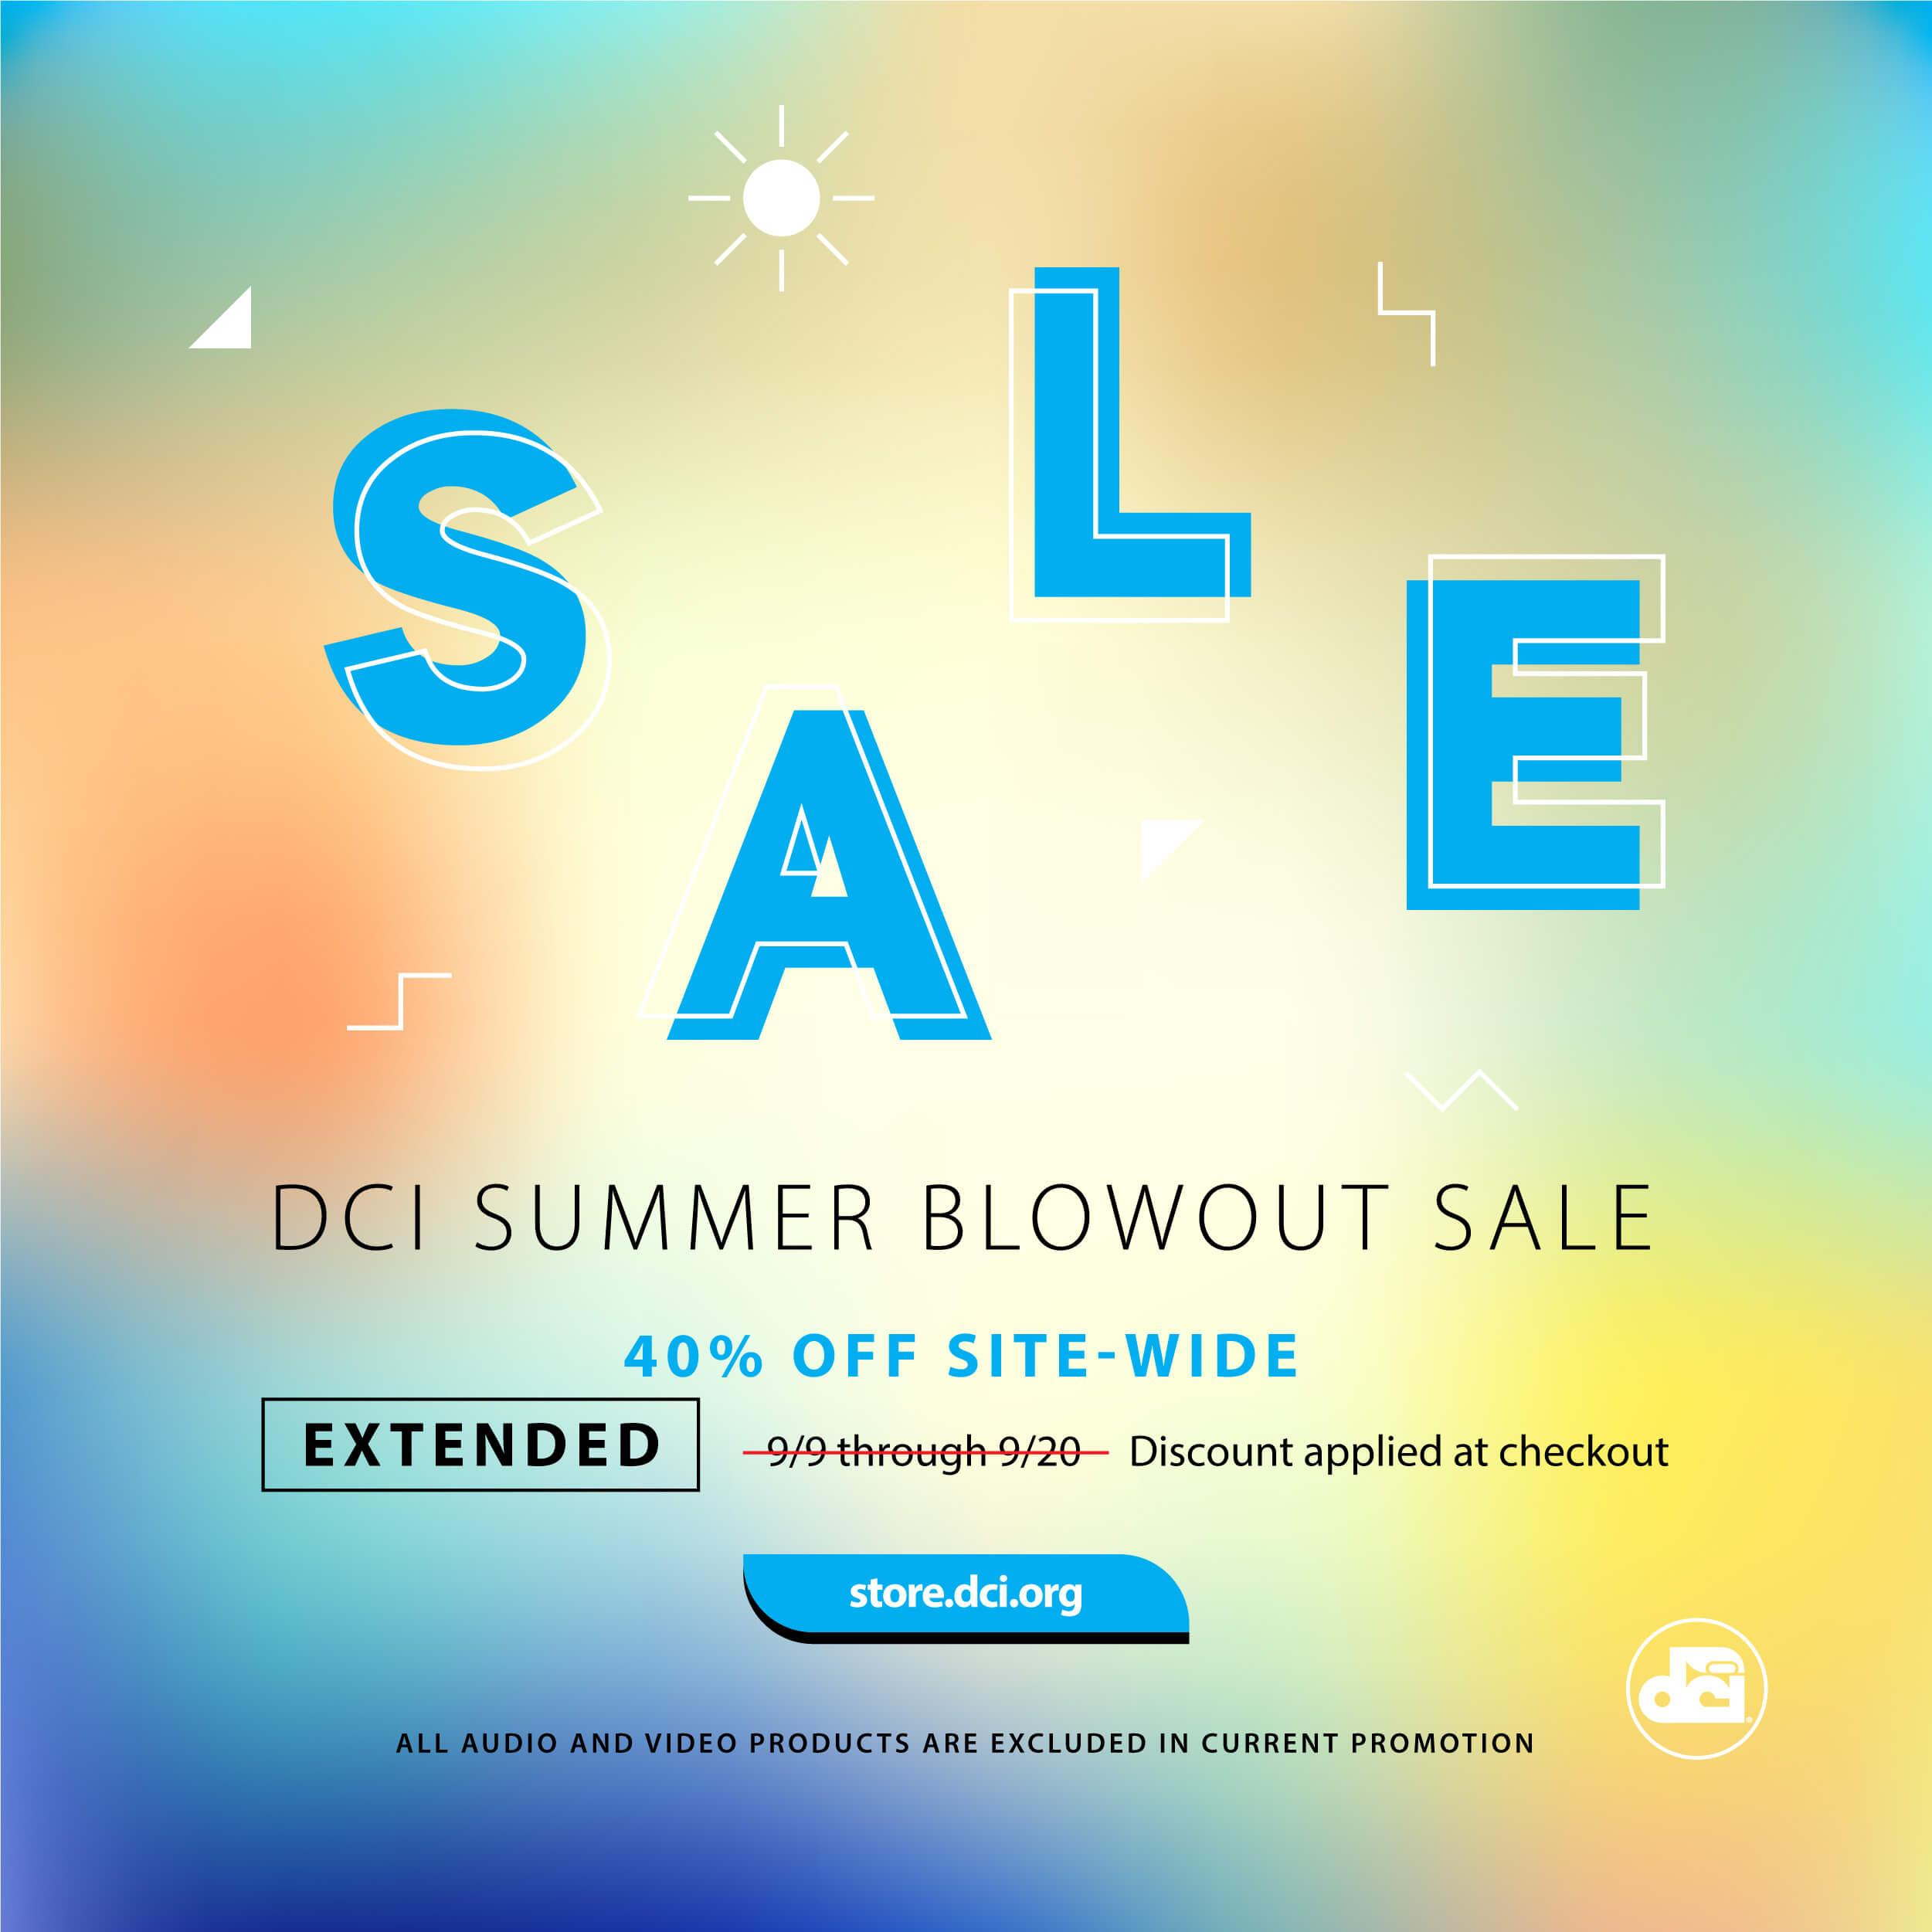 DCI Store promo graphic